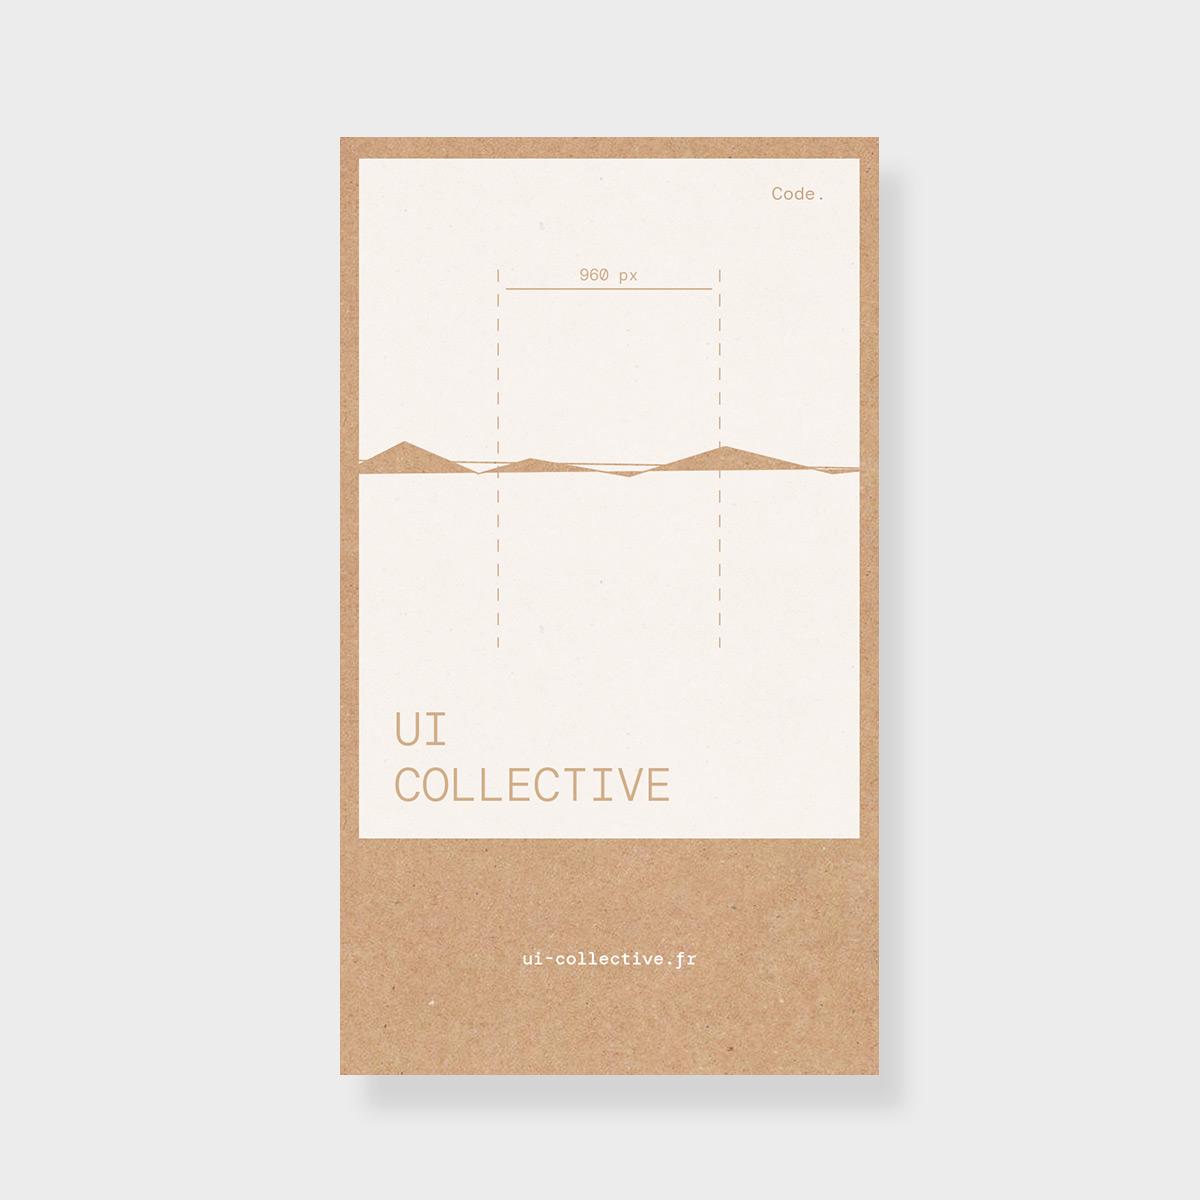 https://isse-ari-design.fr/wp-content/uploads/2020/08/code-ui-collective.jpg